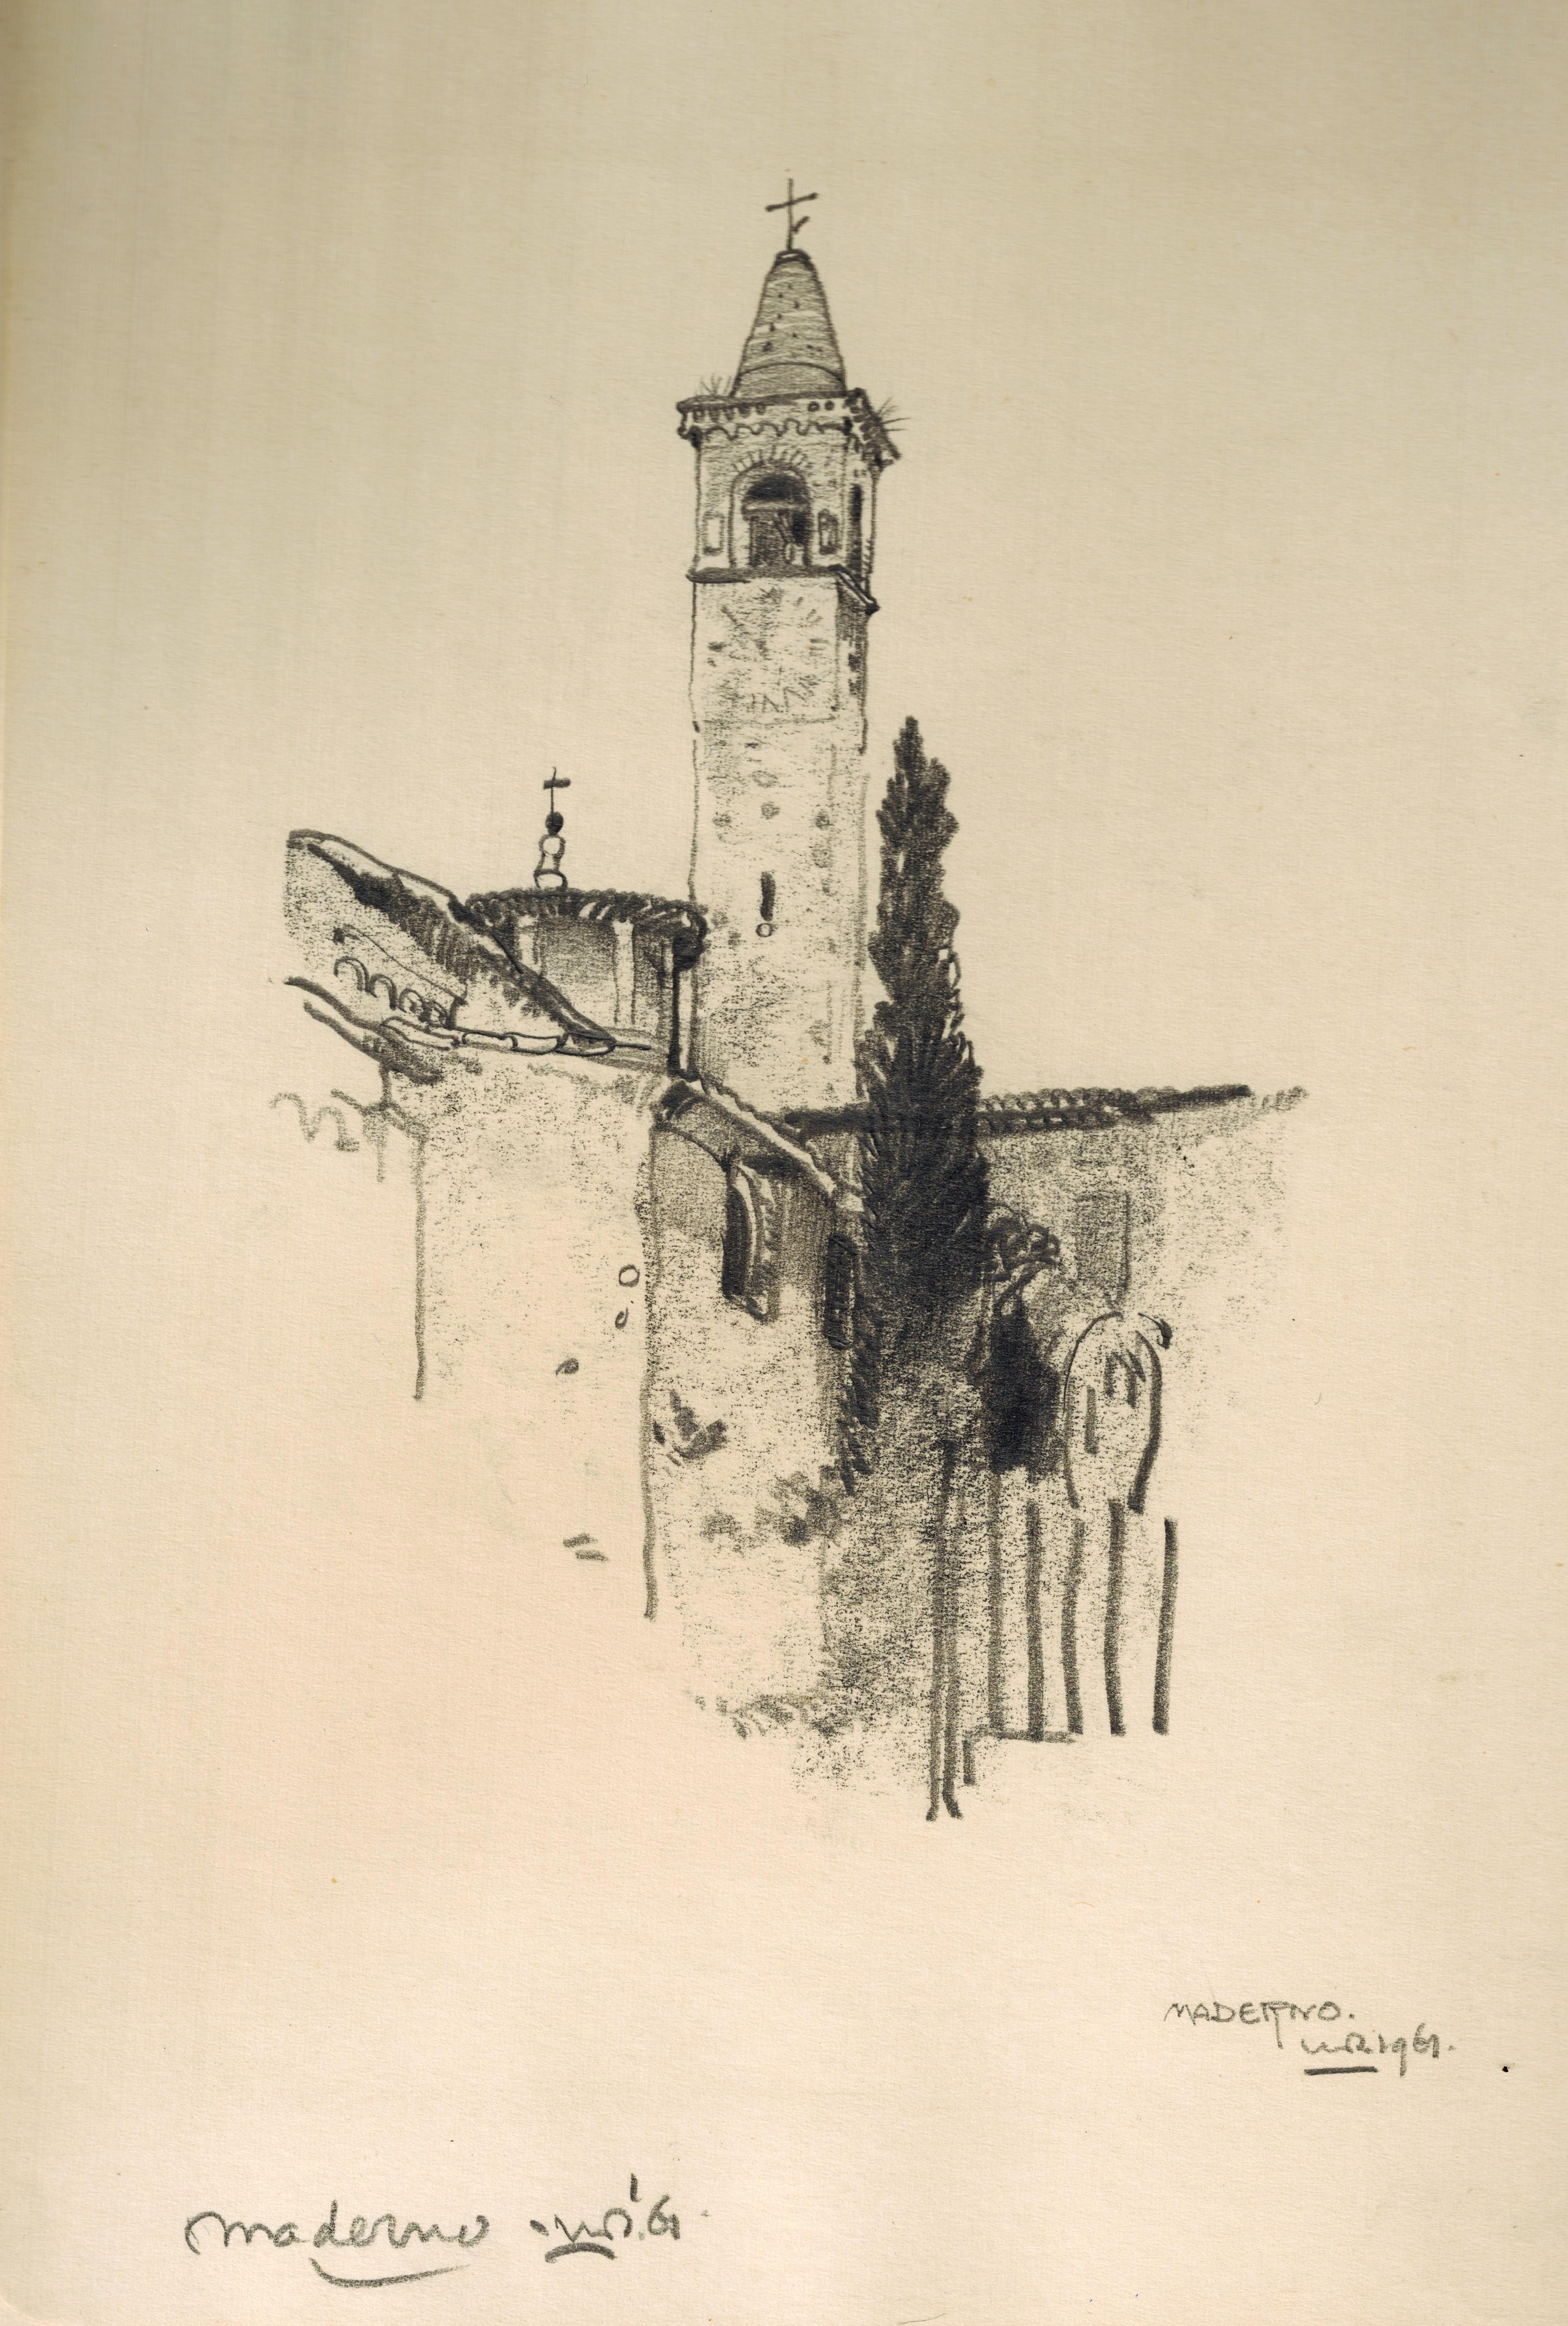 Maderno San Giovanni Church Lago di Garda- Willem van den Berg